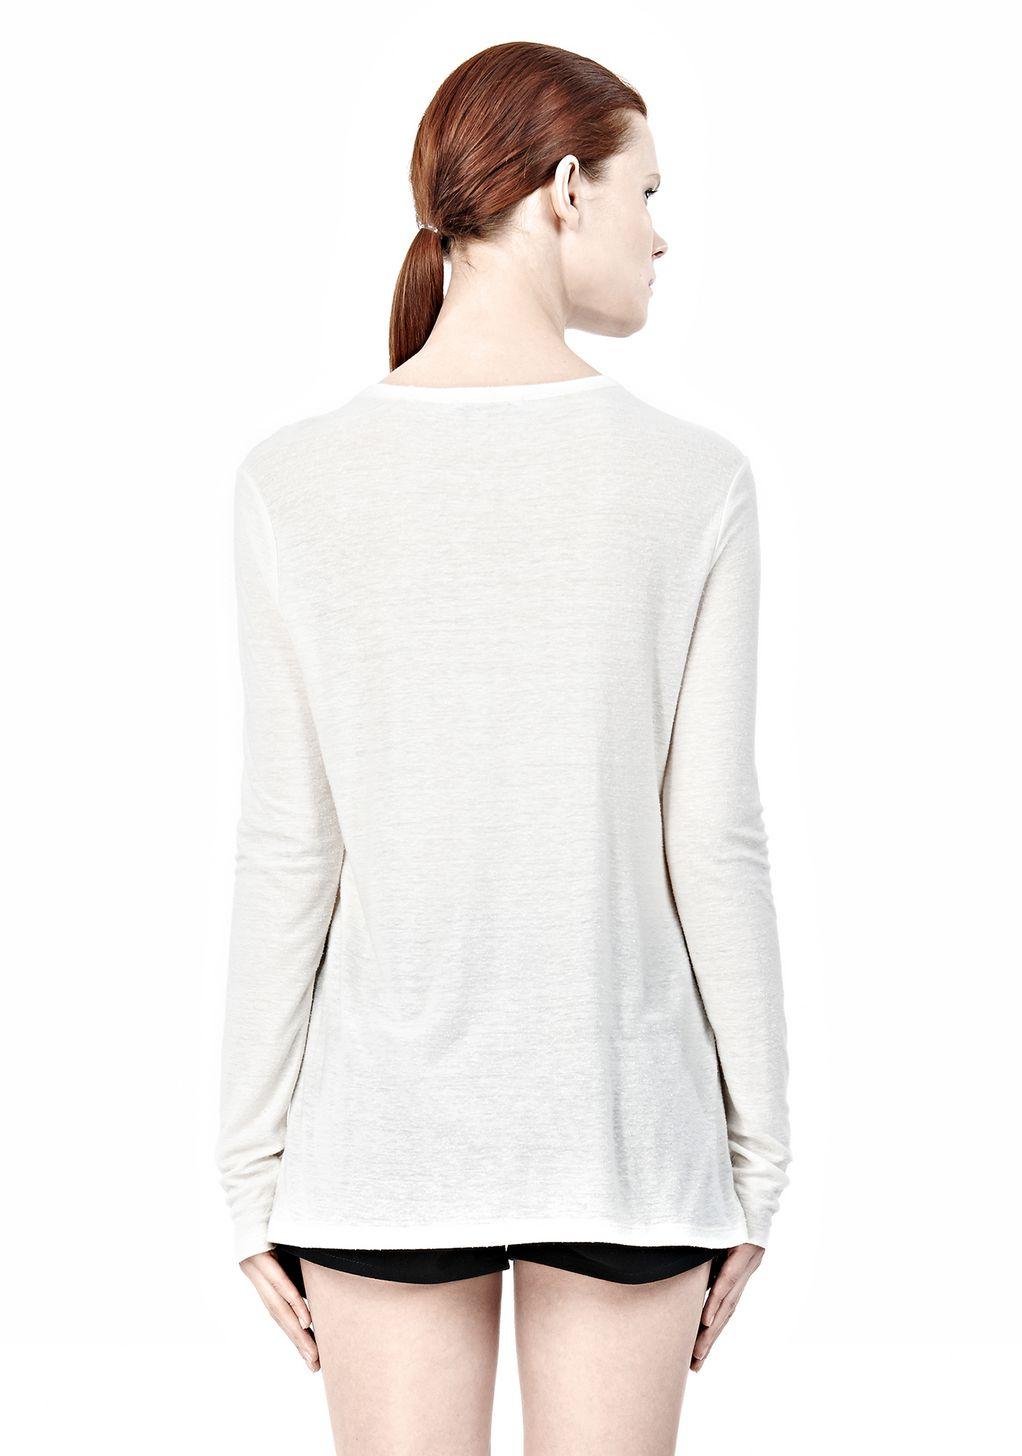 Alexander wang slub classic long sleevetee in natural lyst for Adam lippes women s long sleeve vee t shirt